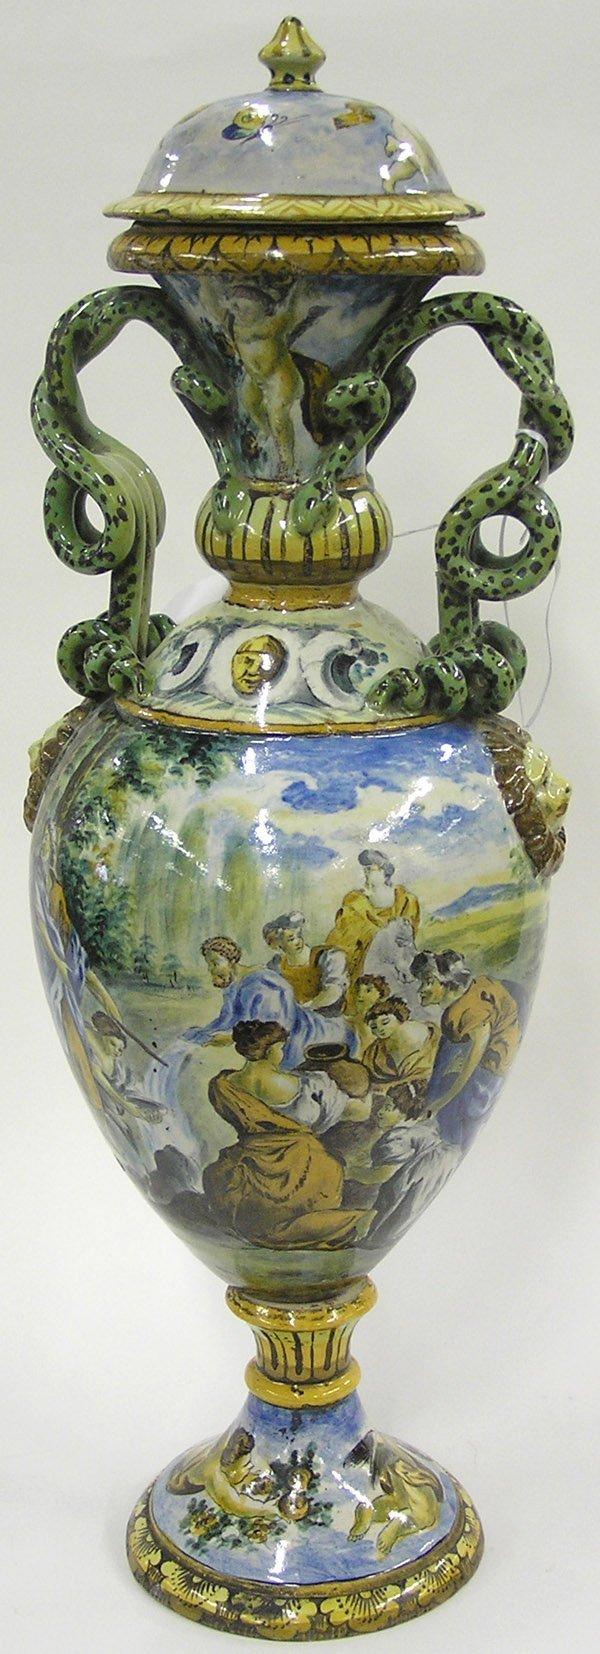 2023: Italain Deruta Faience Pedestal Urn